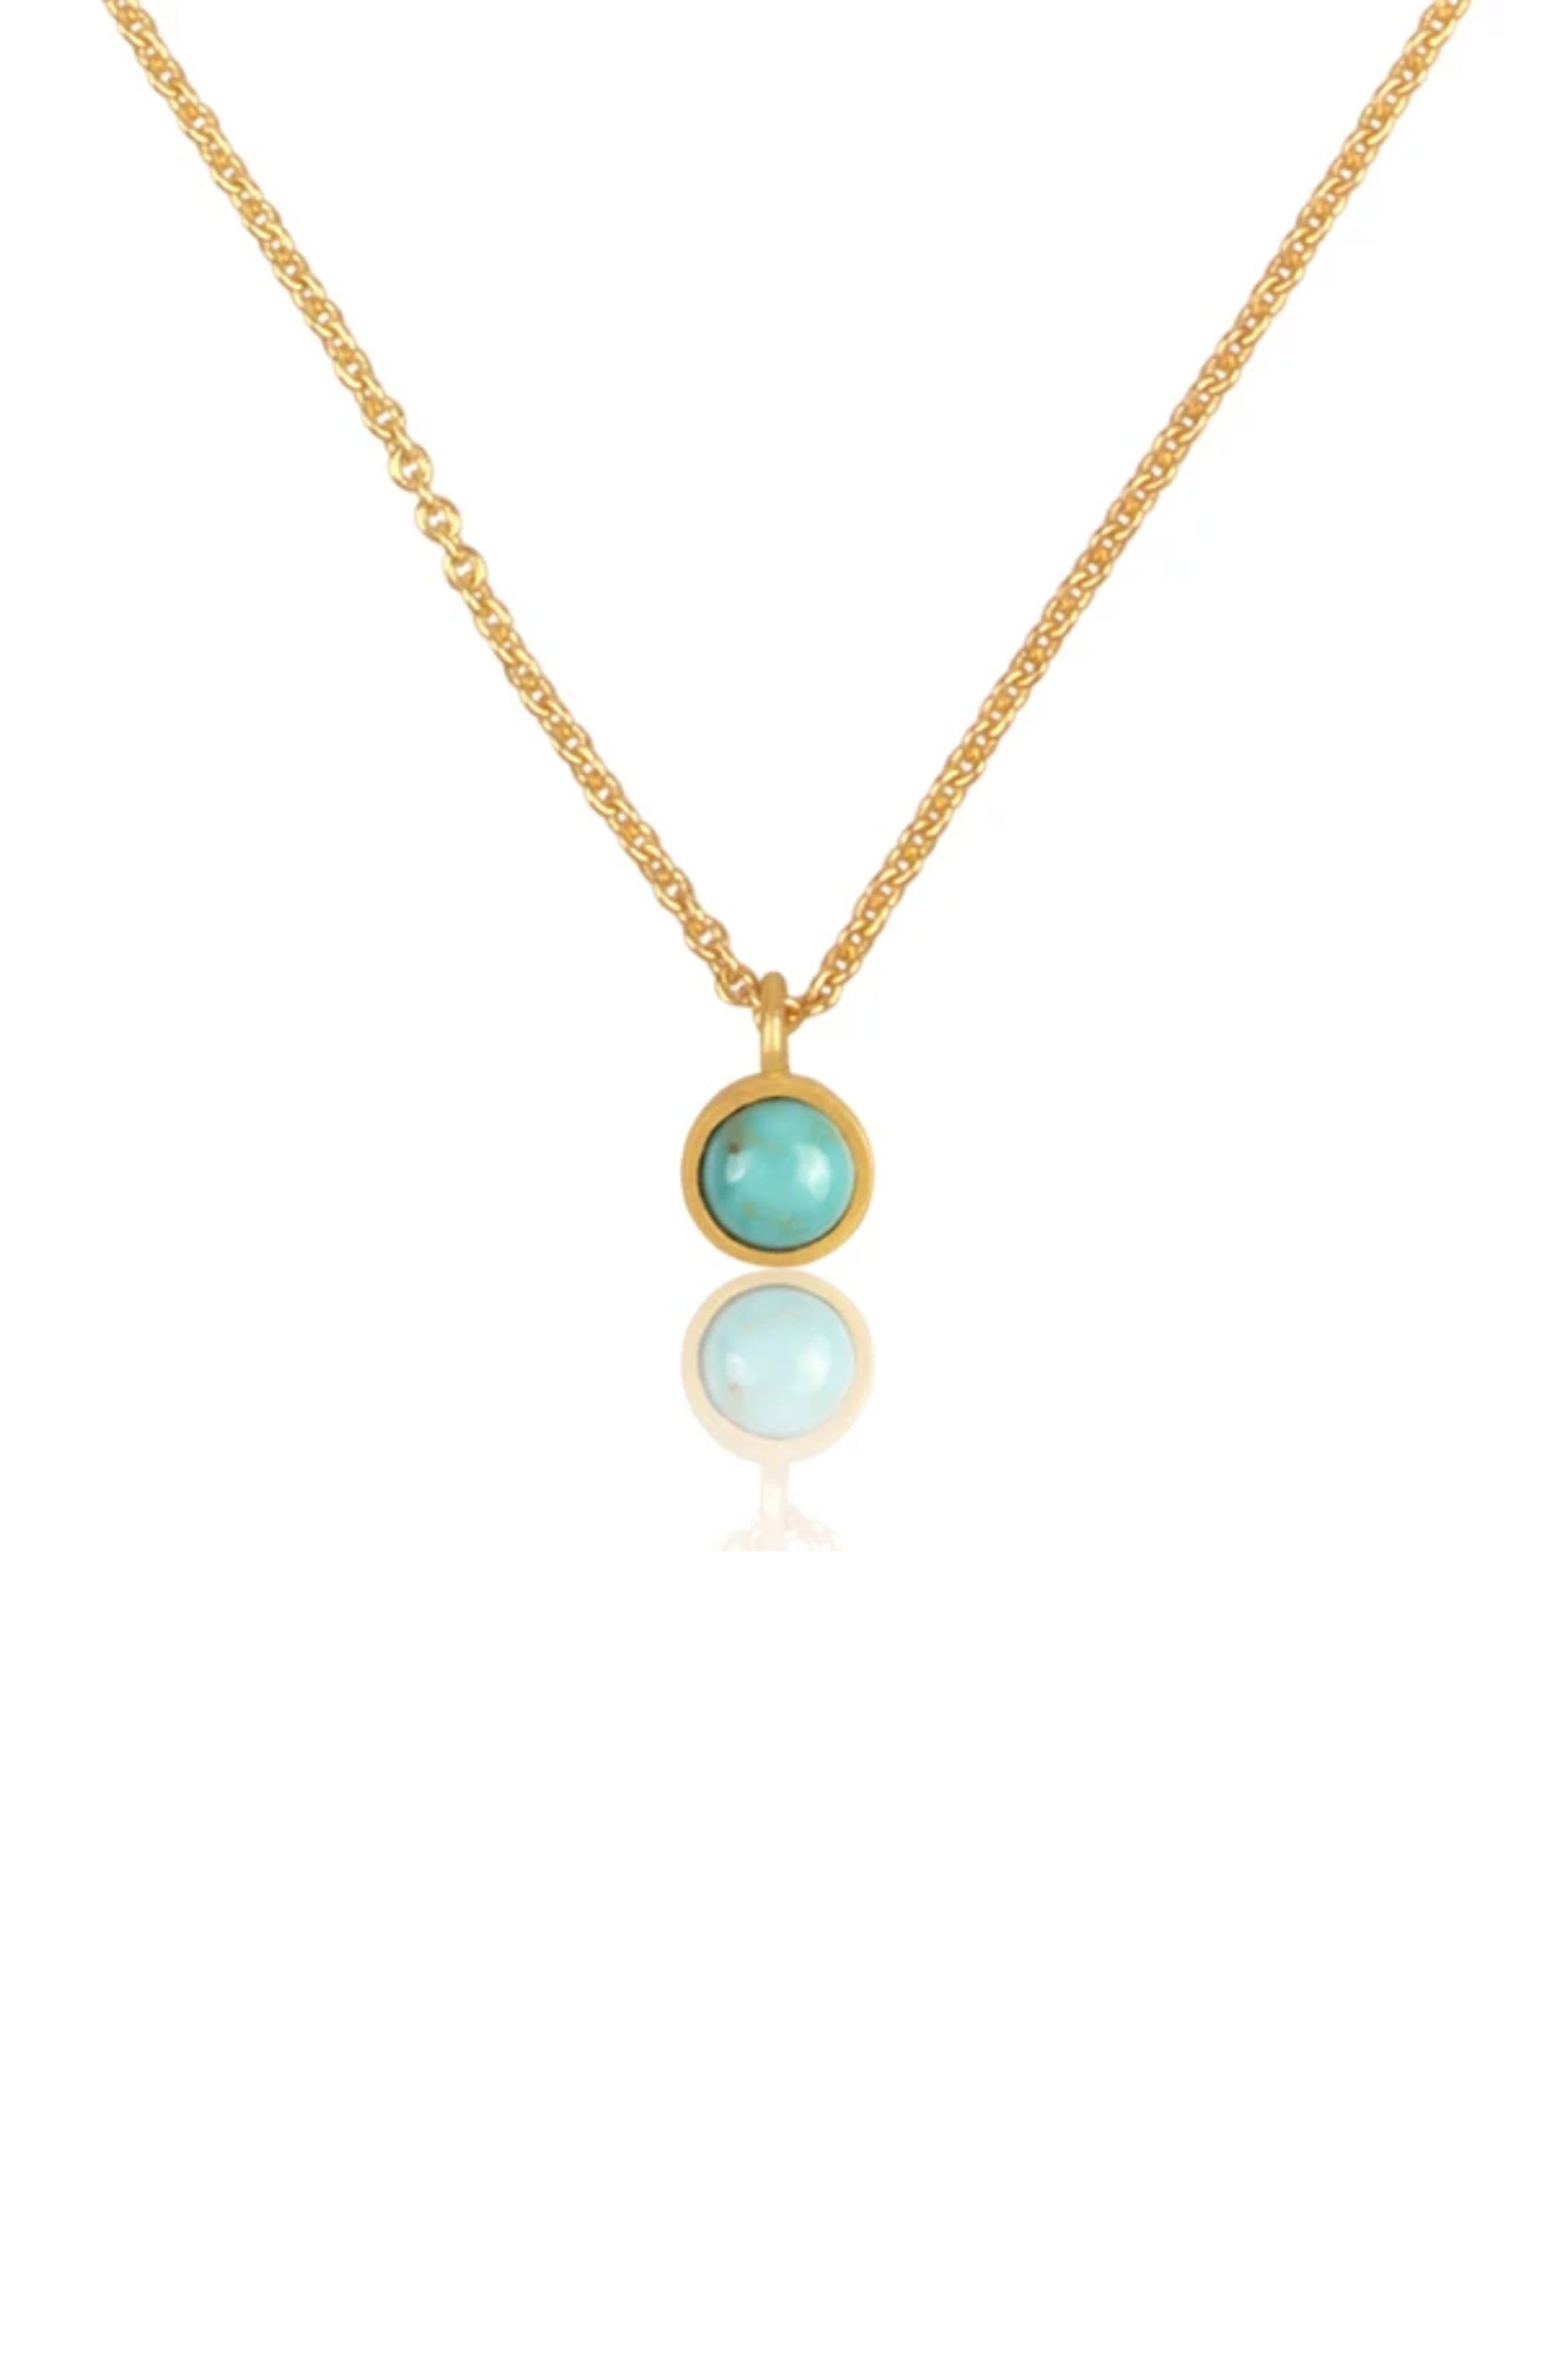 Dainty Turquoise Pendant Necklace